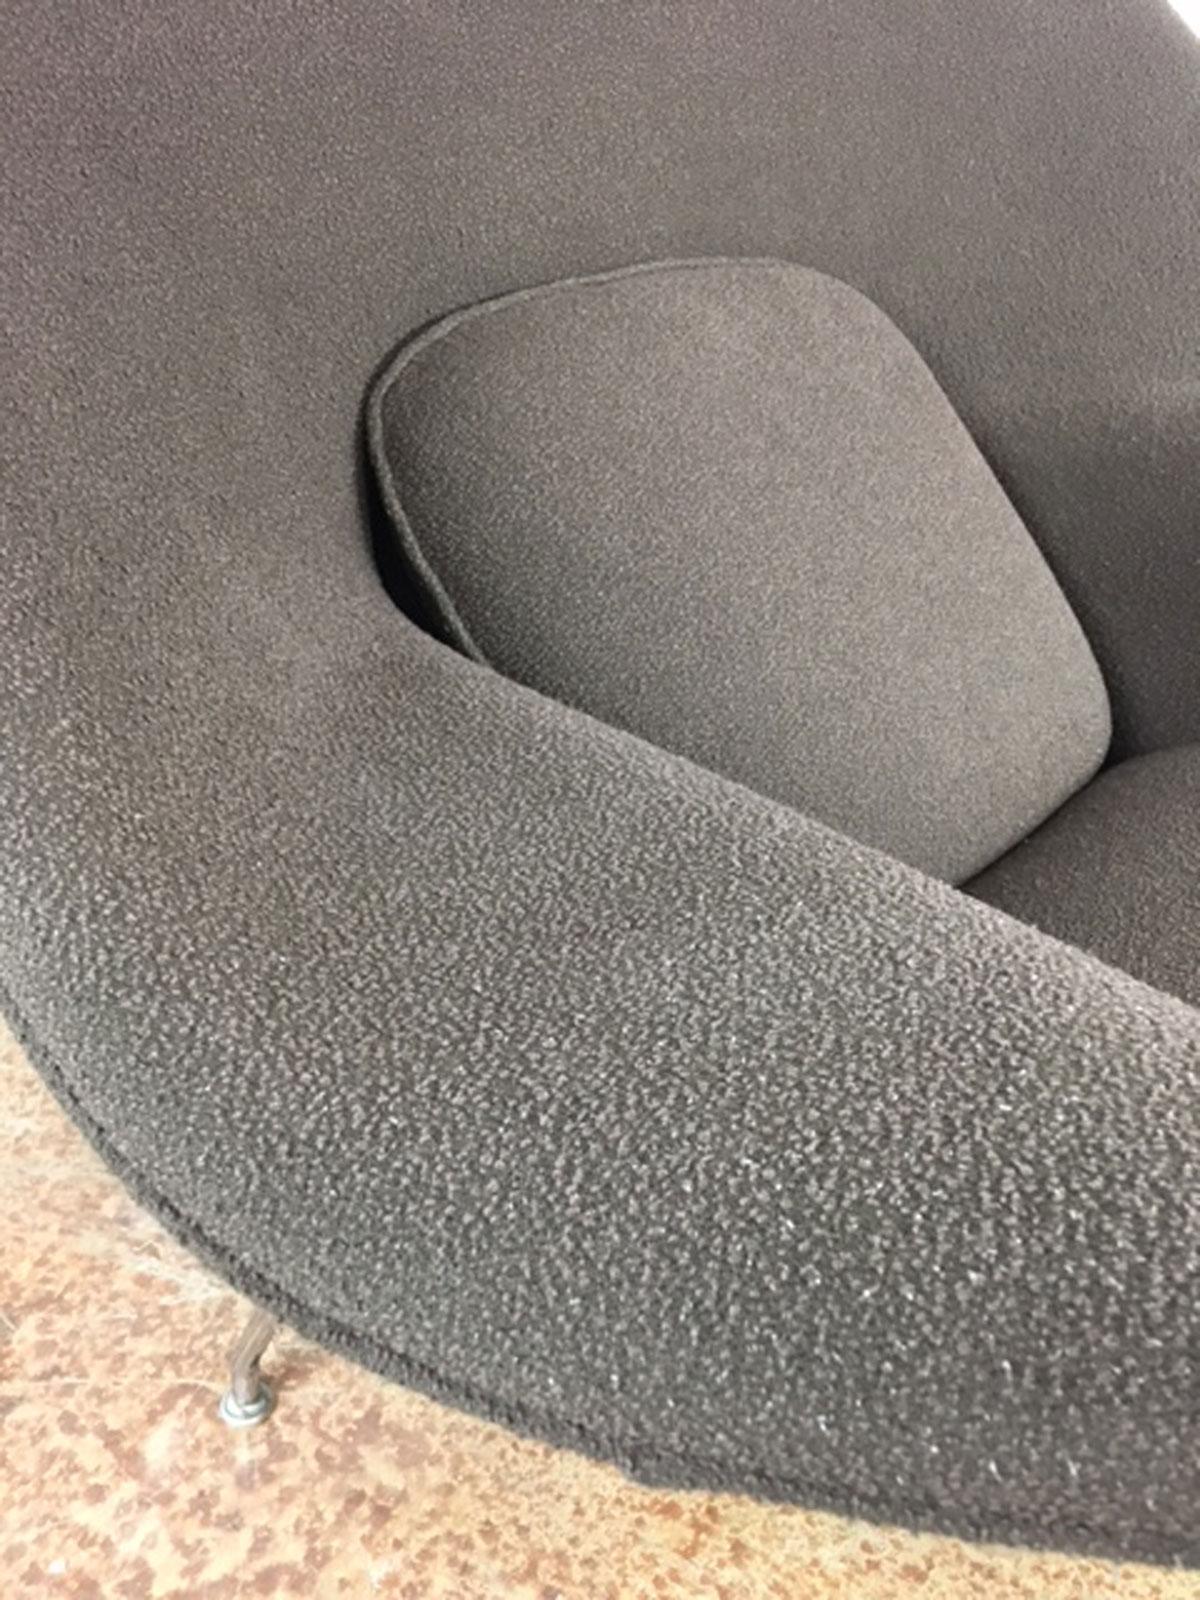 Eero Saarinen Womb Chair by Knoll Two Available Chairish